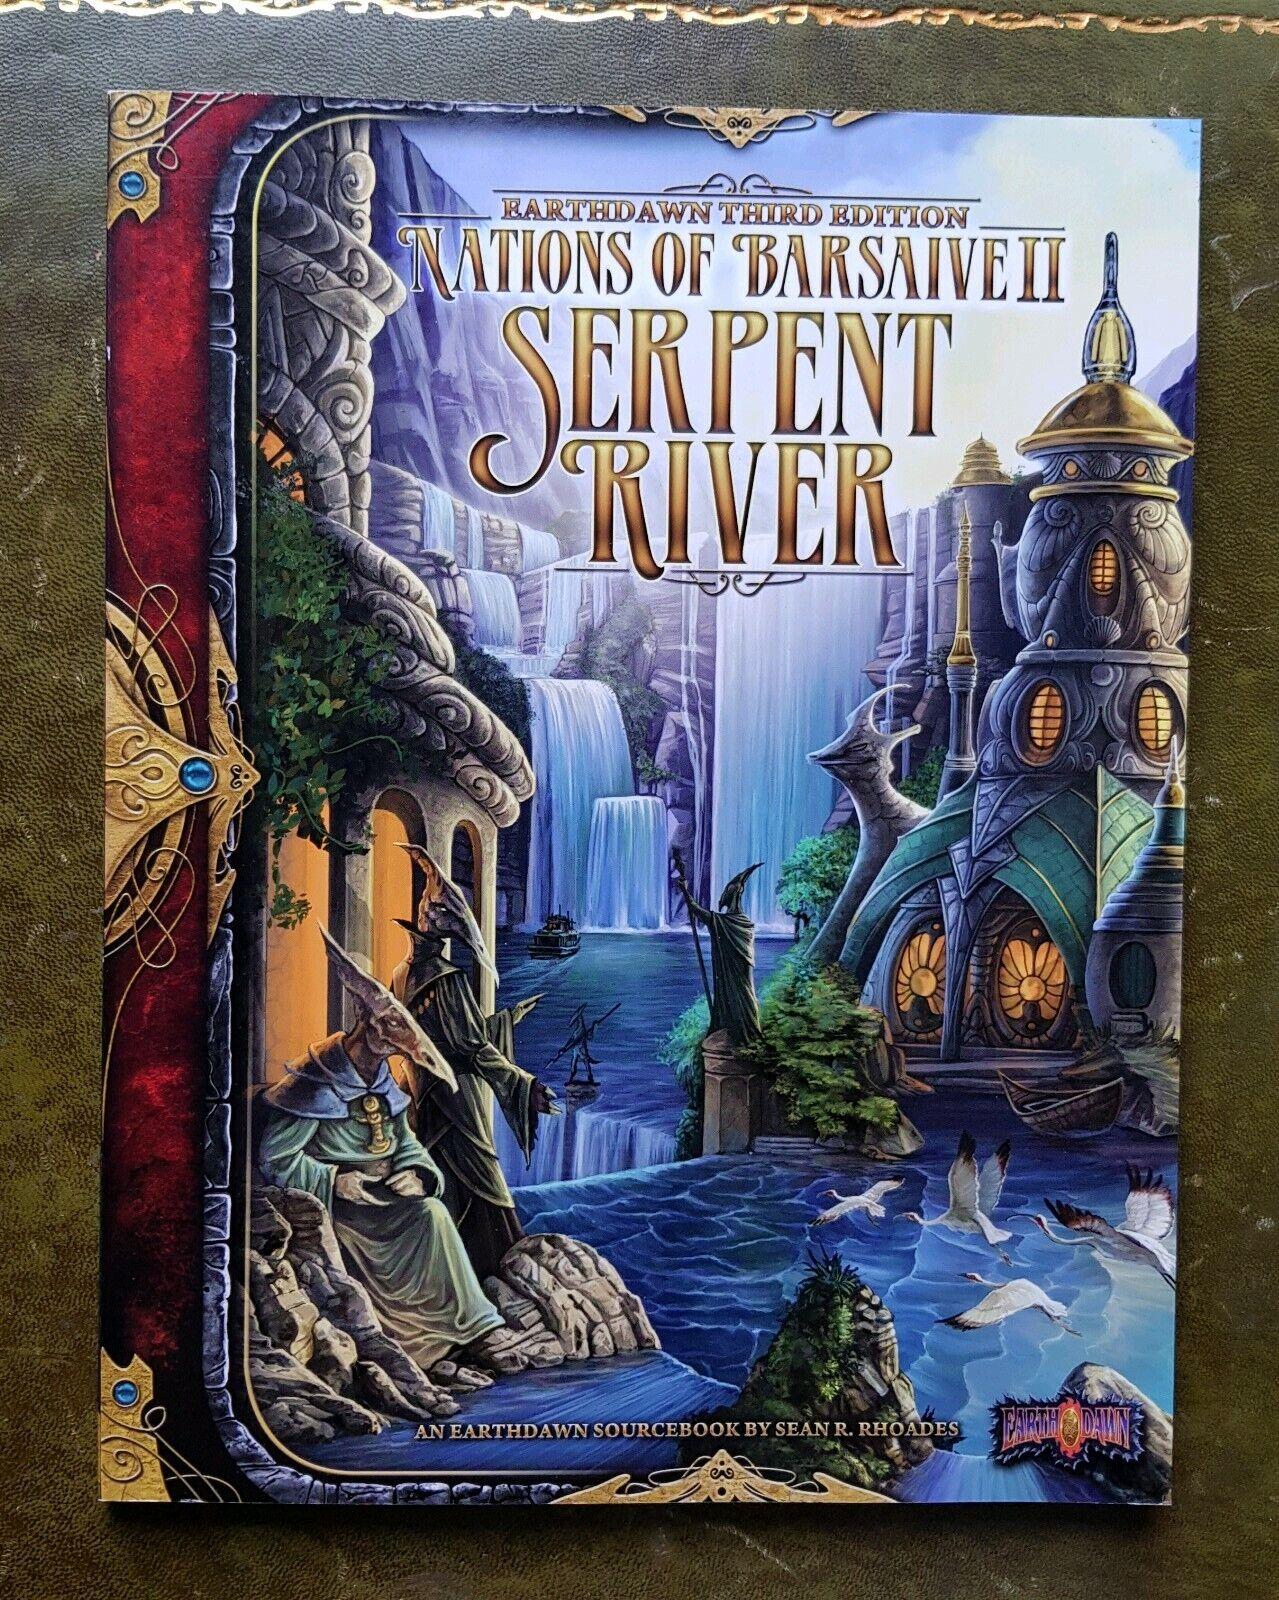 NATIONER OM BARSAV II  SERPENT RIVER - EkonsthDAWN 3RD RPG FASA 2 ROLEspelaing